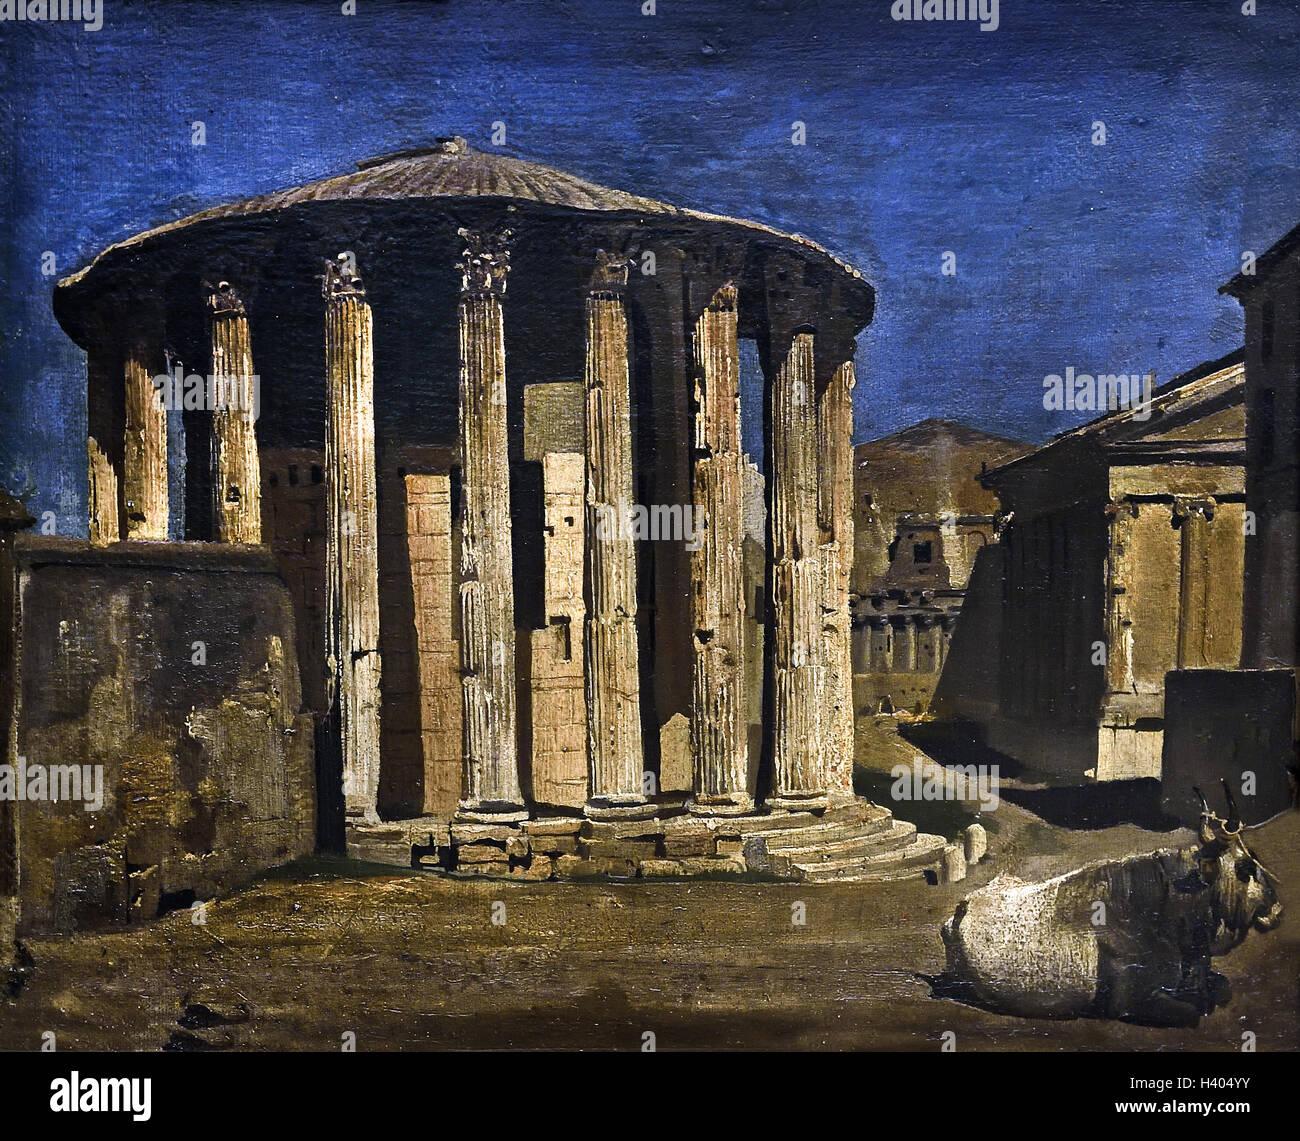 Temple of Vesta in Rome 1858 Italy Italian  by Franz von Lenbach 1836-1904 German Germany - Stock Image